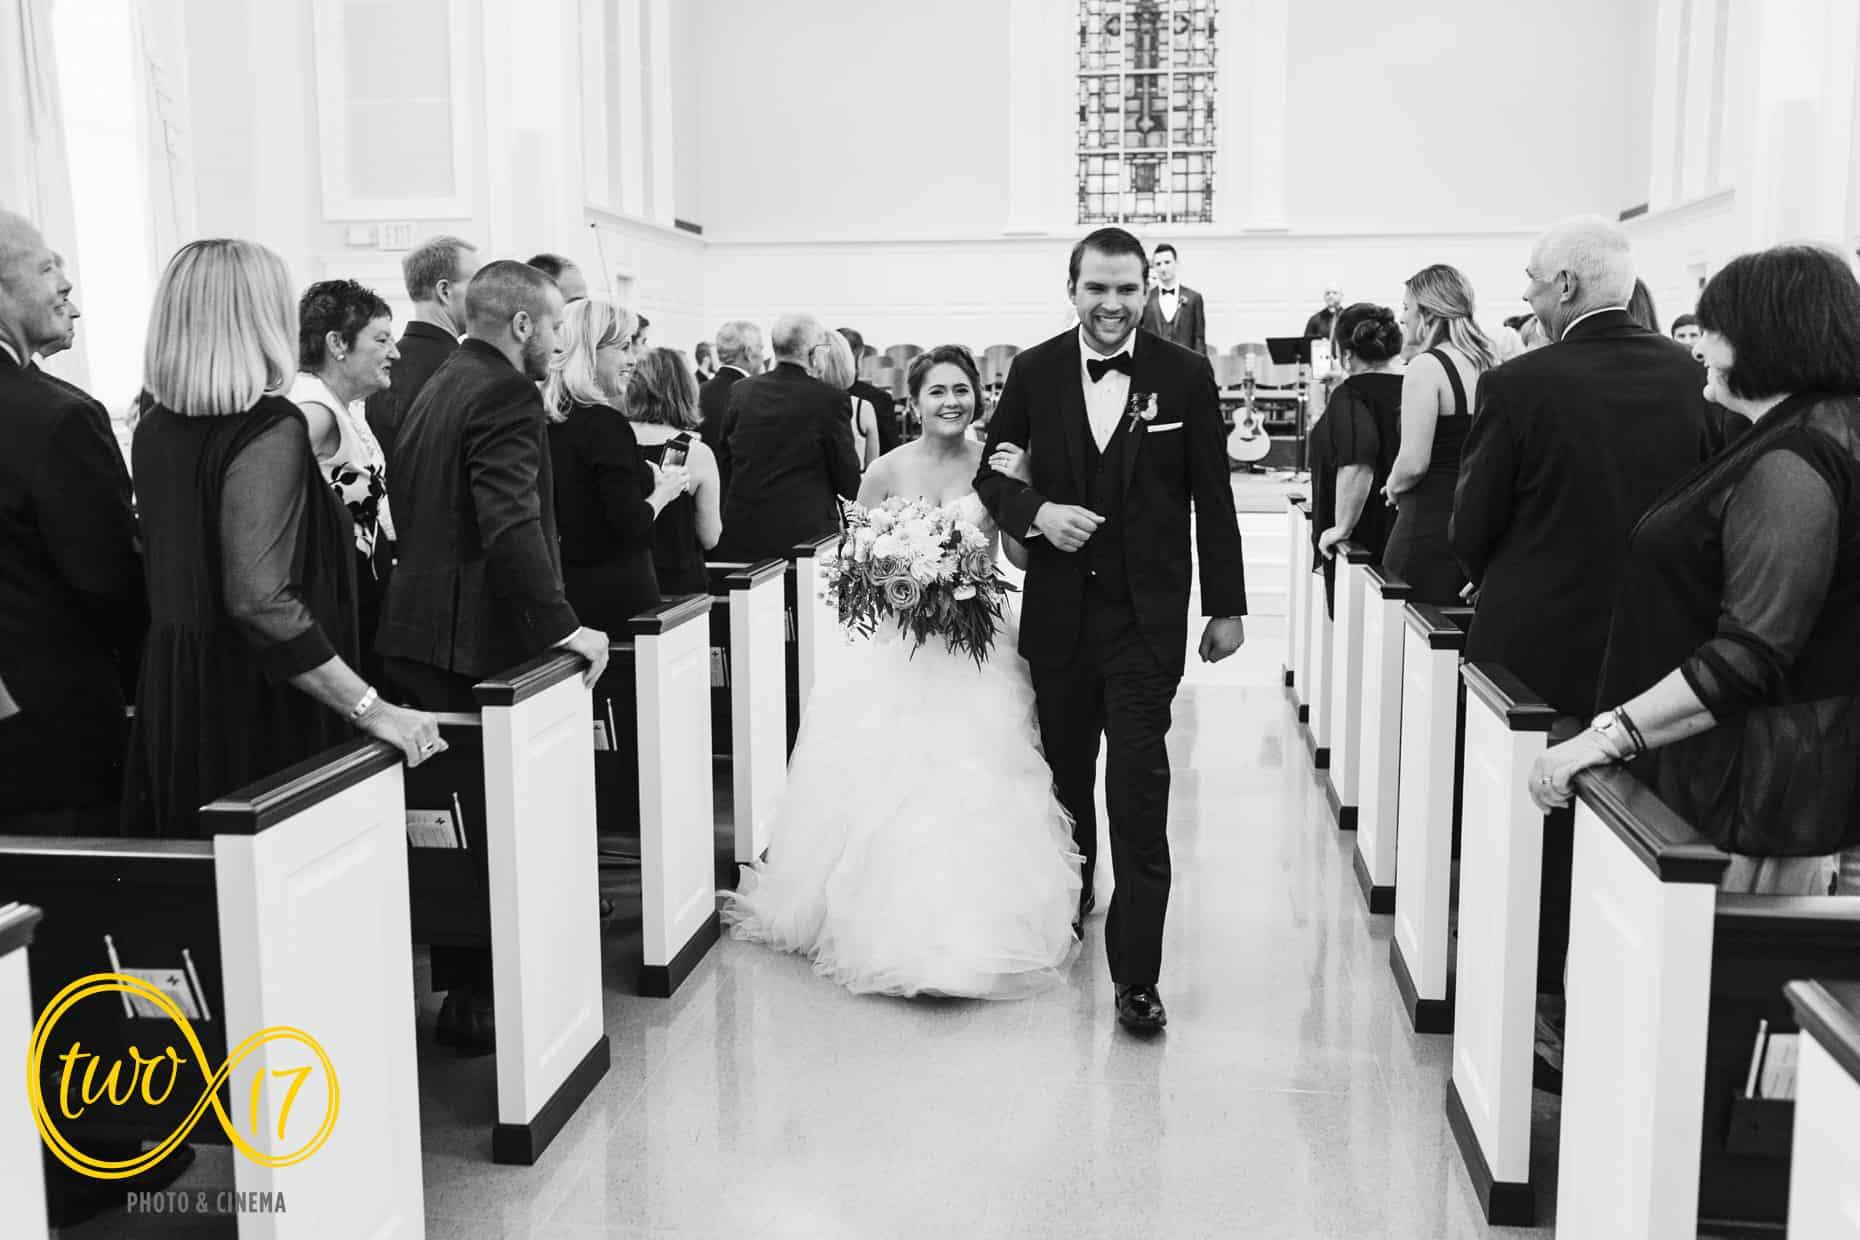 Philadelphia area weddings